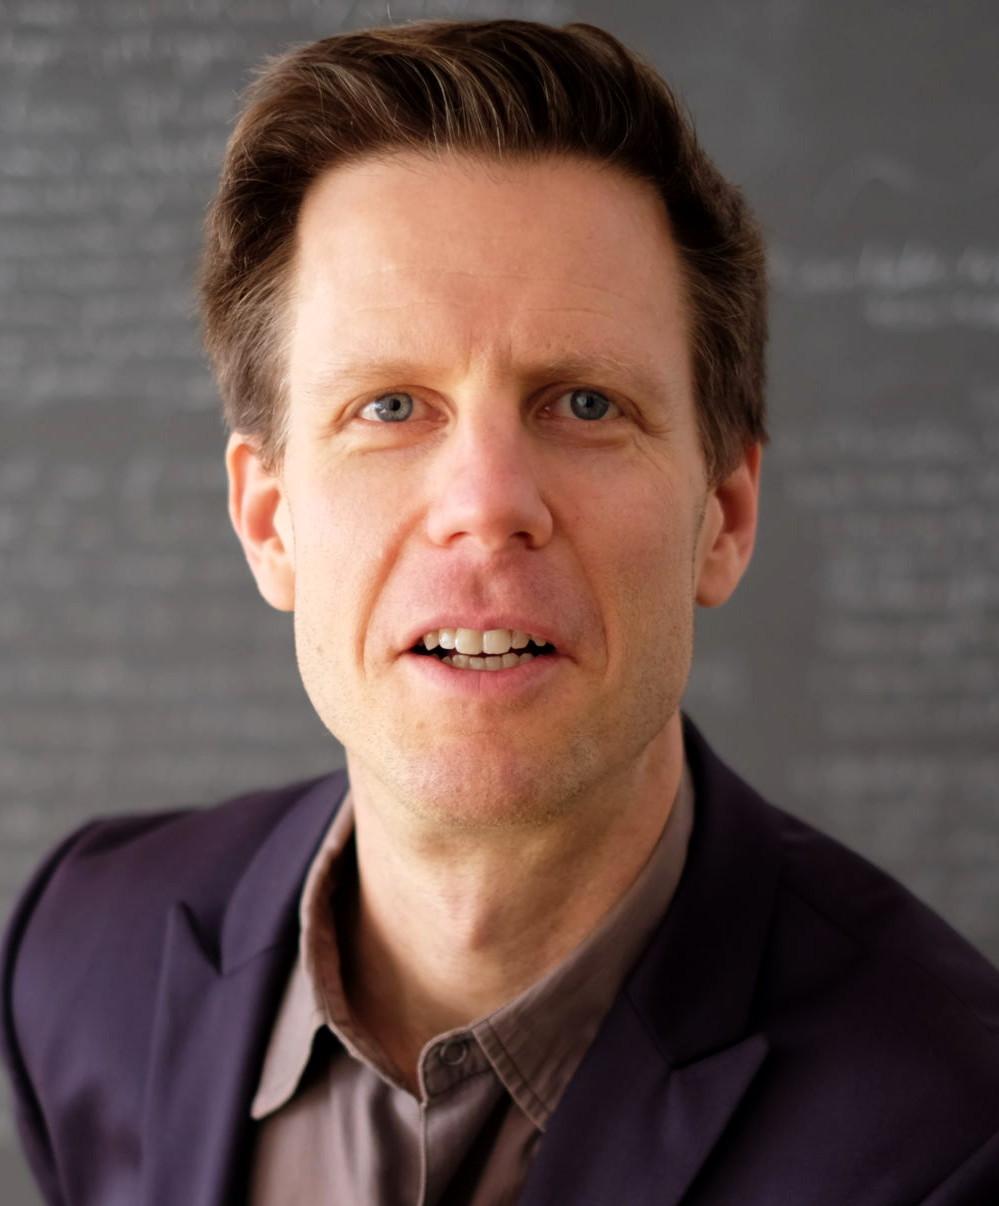 Jim Harshaw interviews author, PhD, MBA Josh Spodek